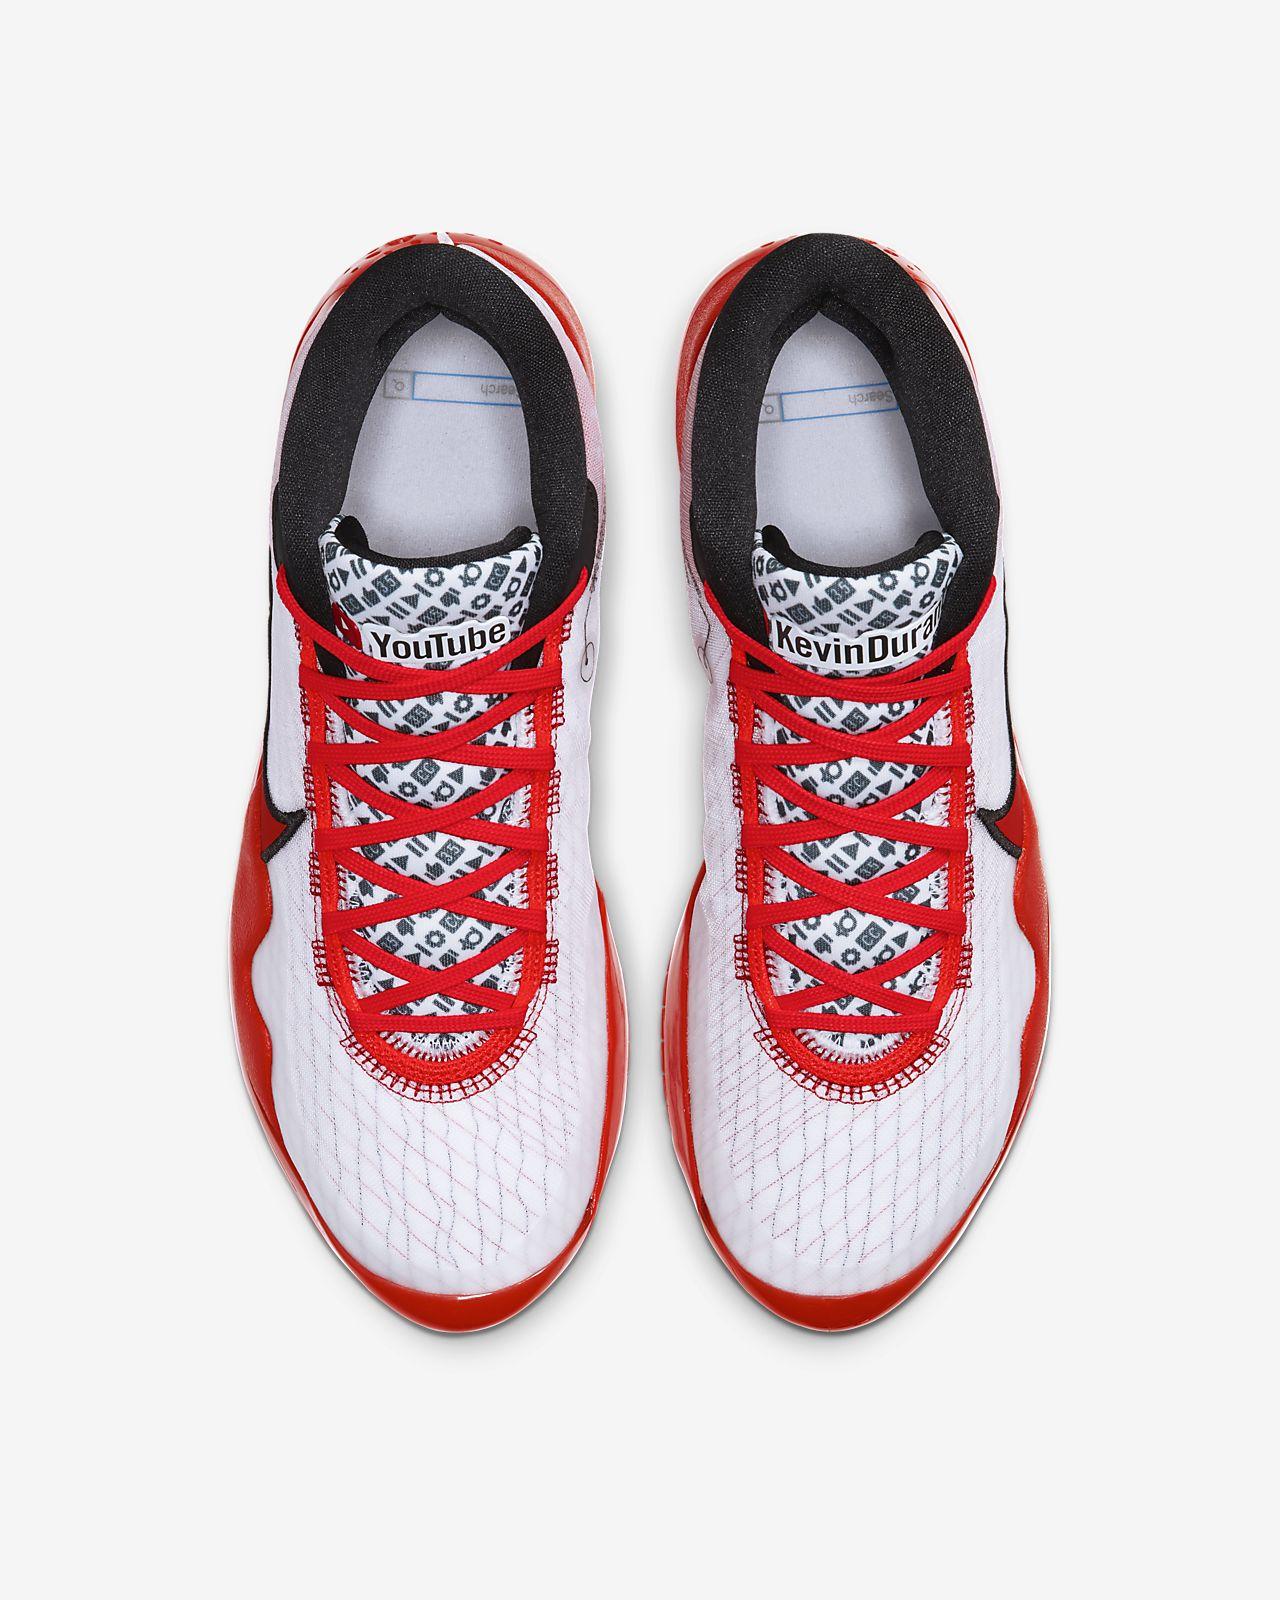 Scarpa da basket Nike Zoom KD12 YouTube. Nike IT  Lc8lrz